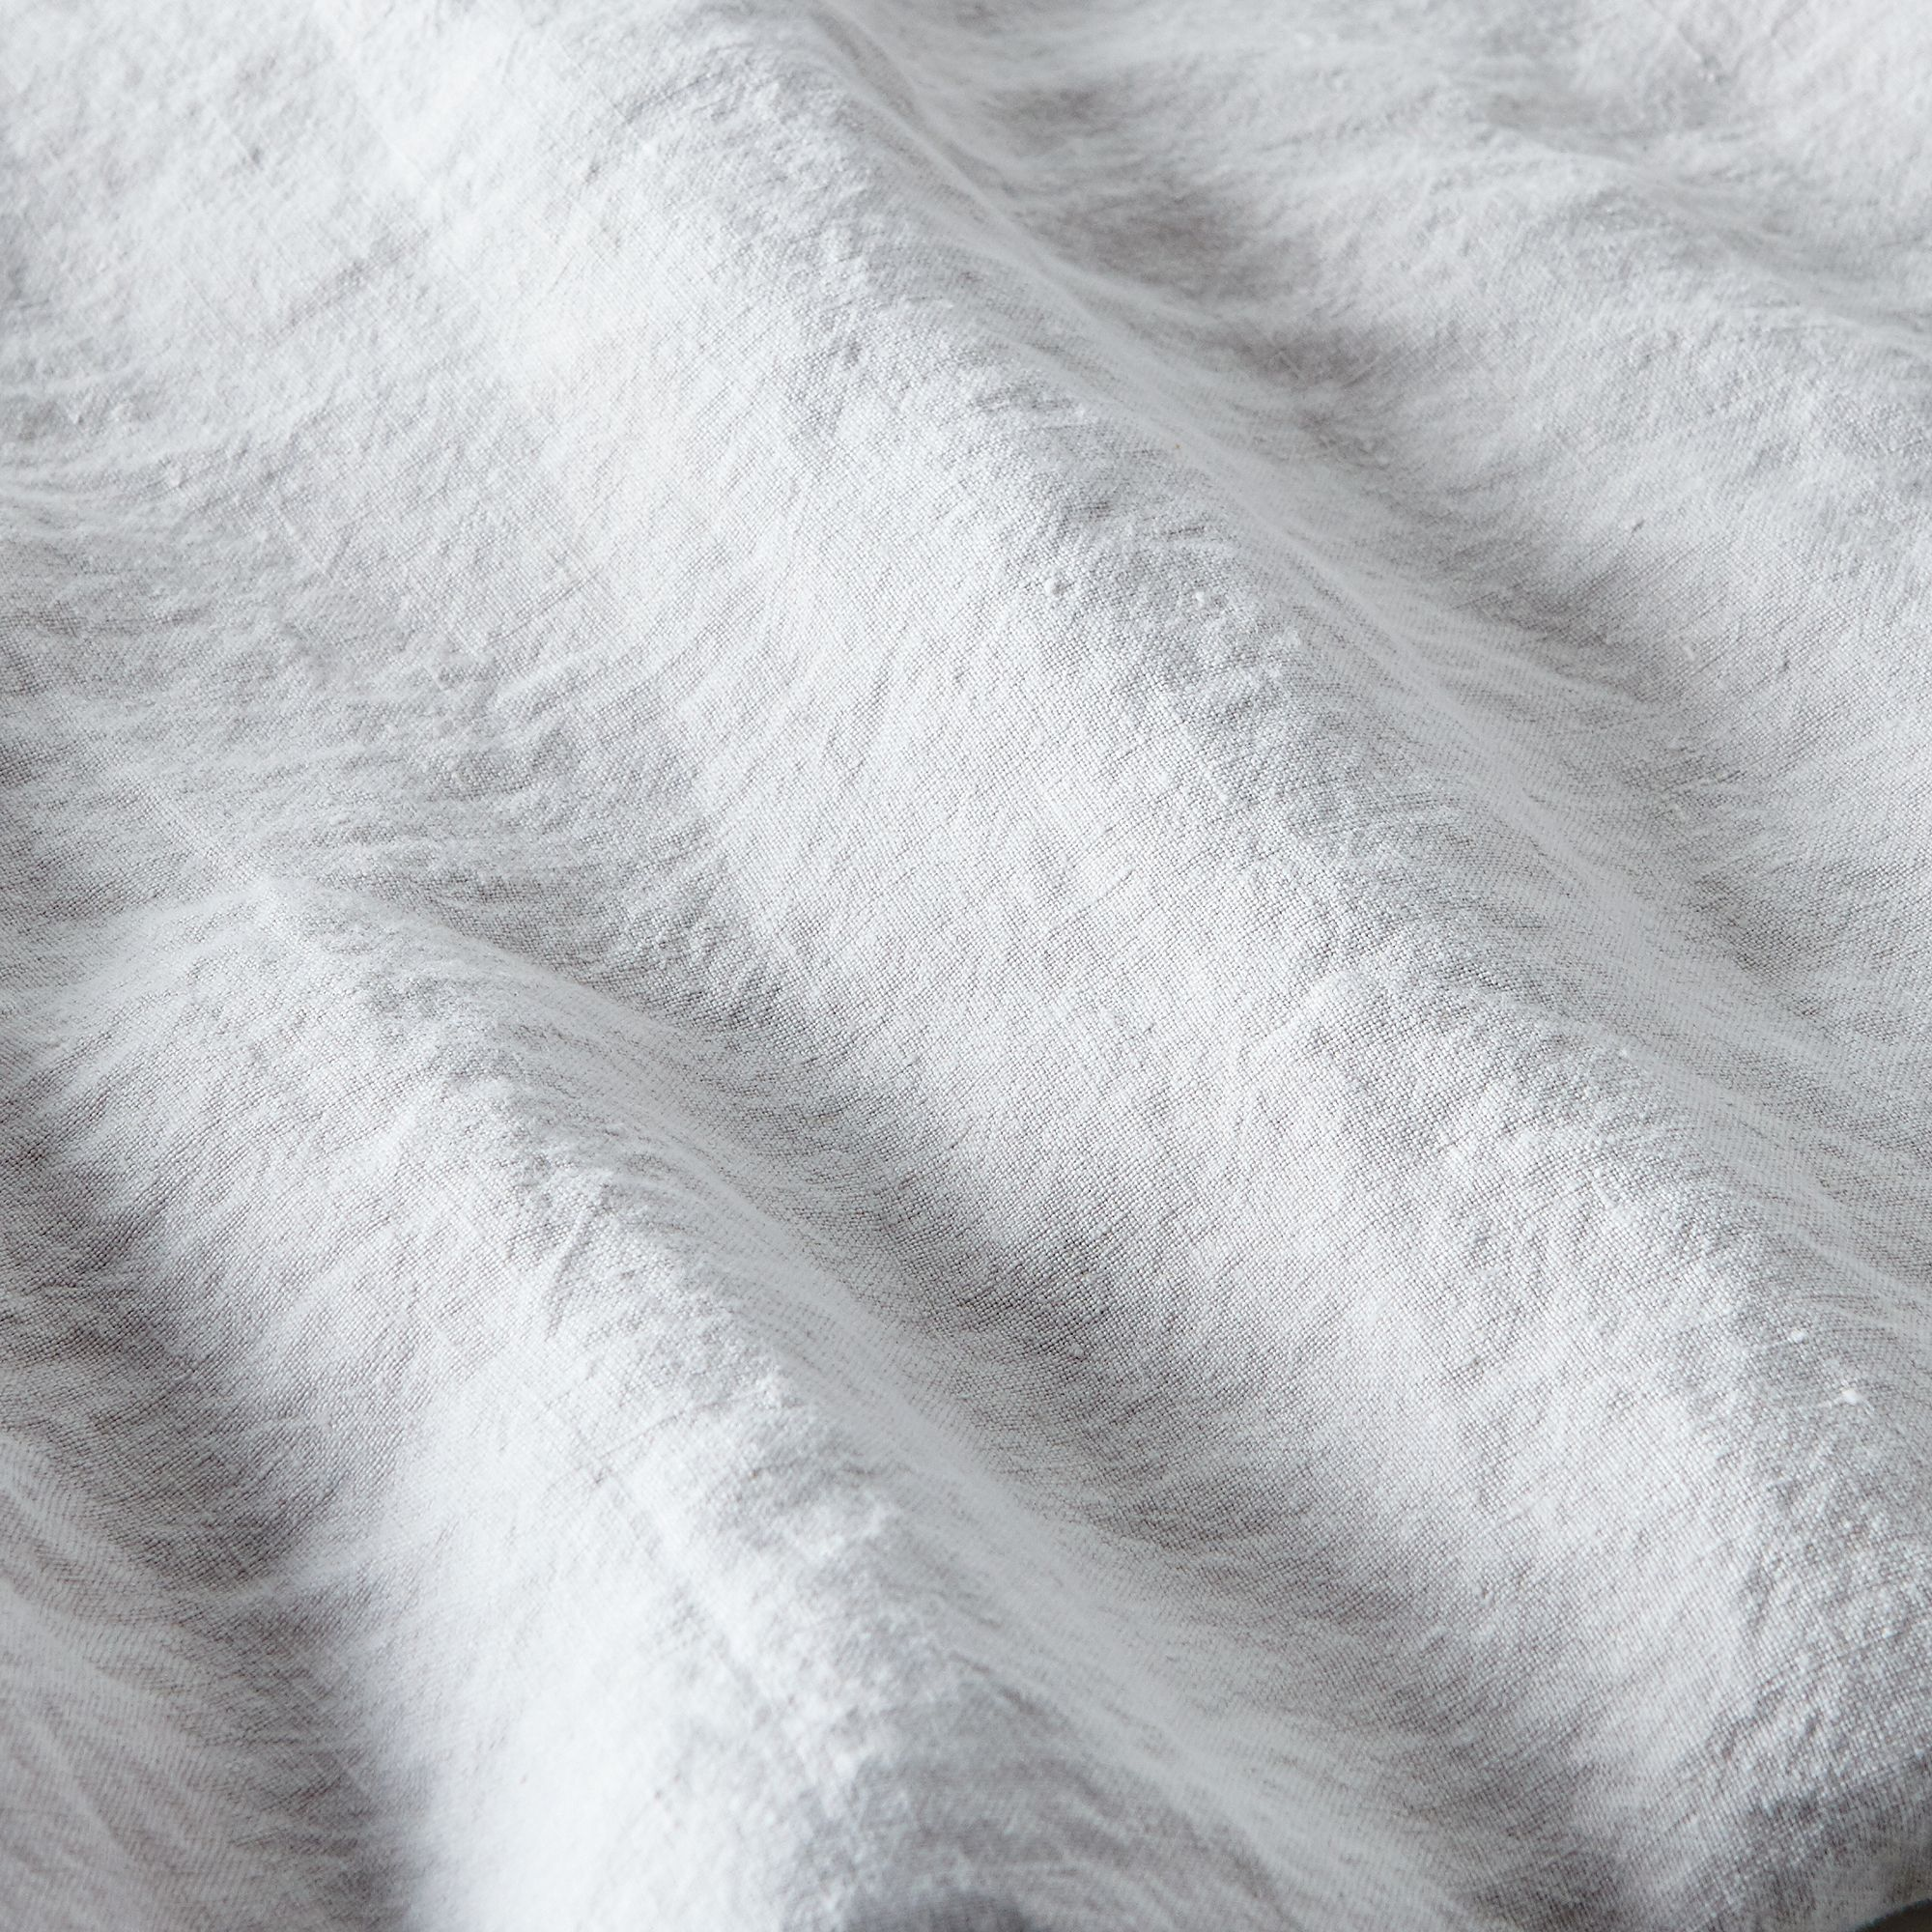 06d3f6e4 a0f9 11e5 a190 0ef7535729df  2015 1008 hawkins ny stonewashed linen bedding sheet light grey silo rocky luten 008